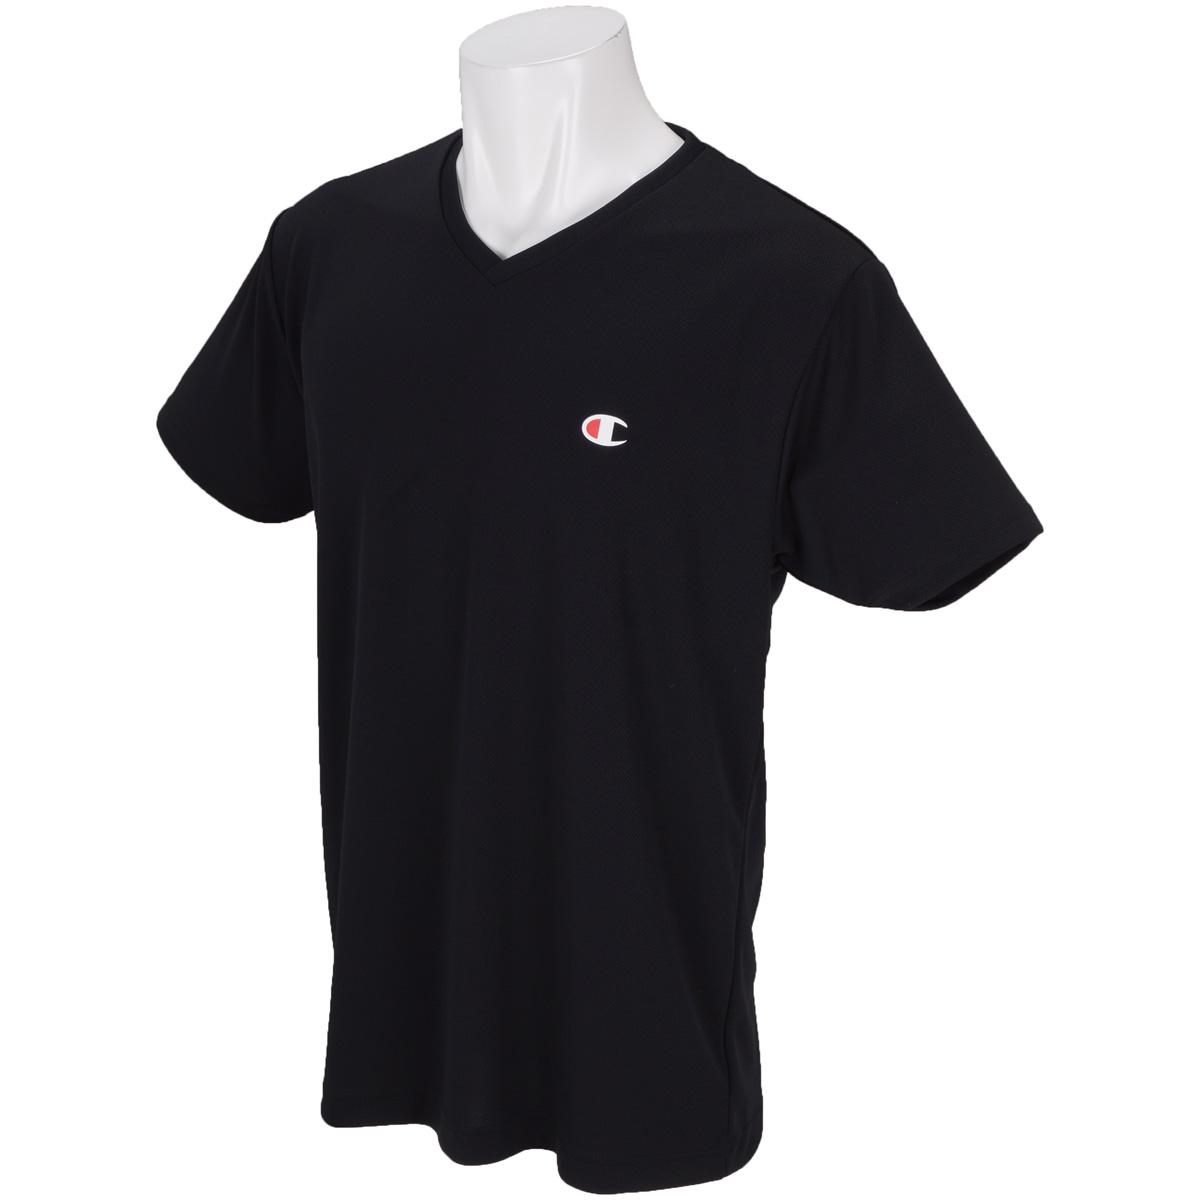 PE MESH Vネックアンダー半袖Tシャツ